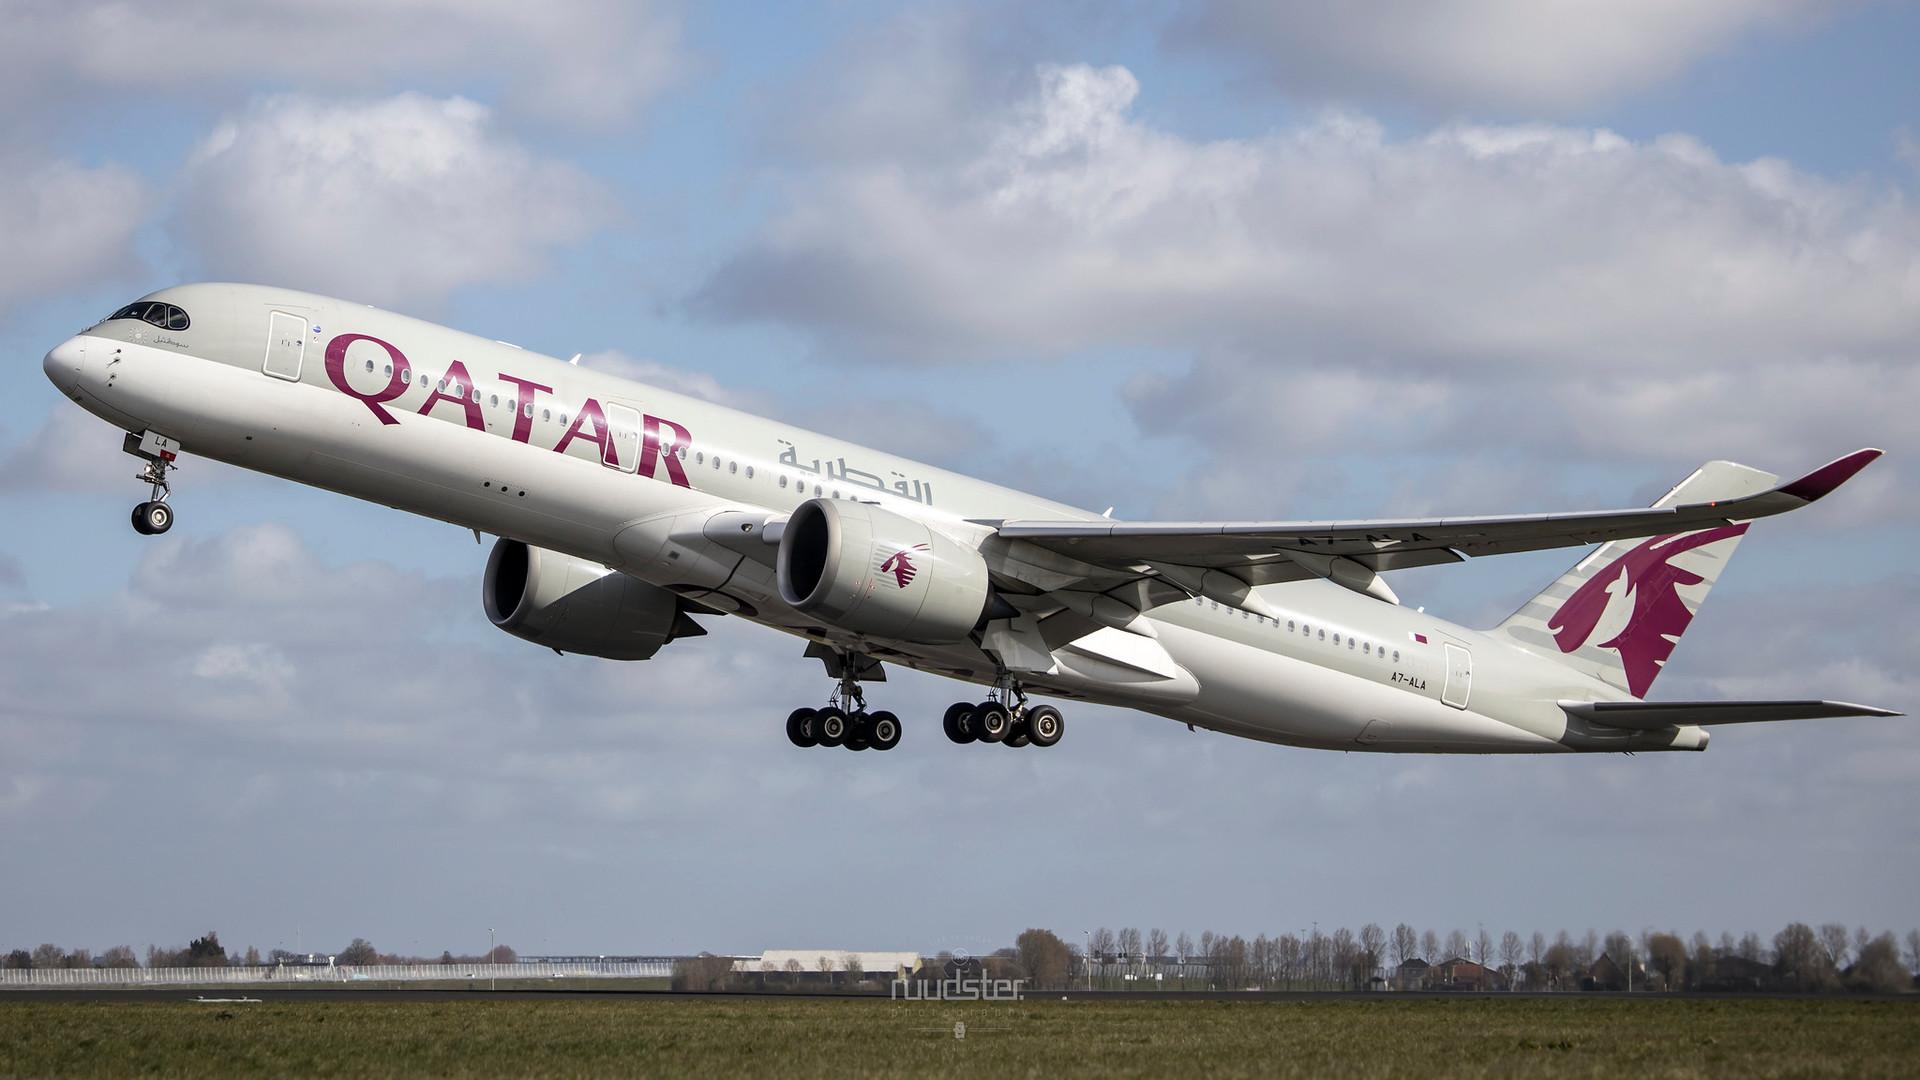 A7-ALA | Build: 2014 - Airbus A350-900